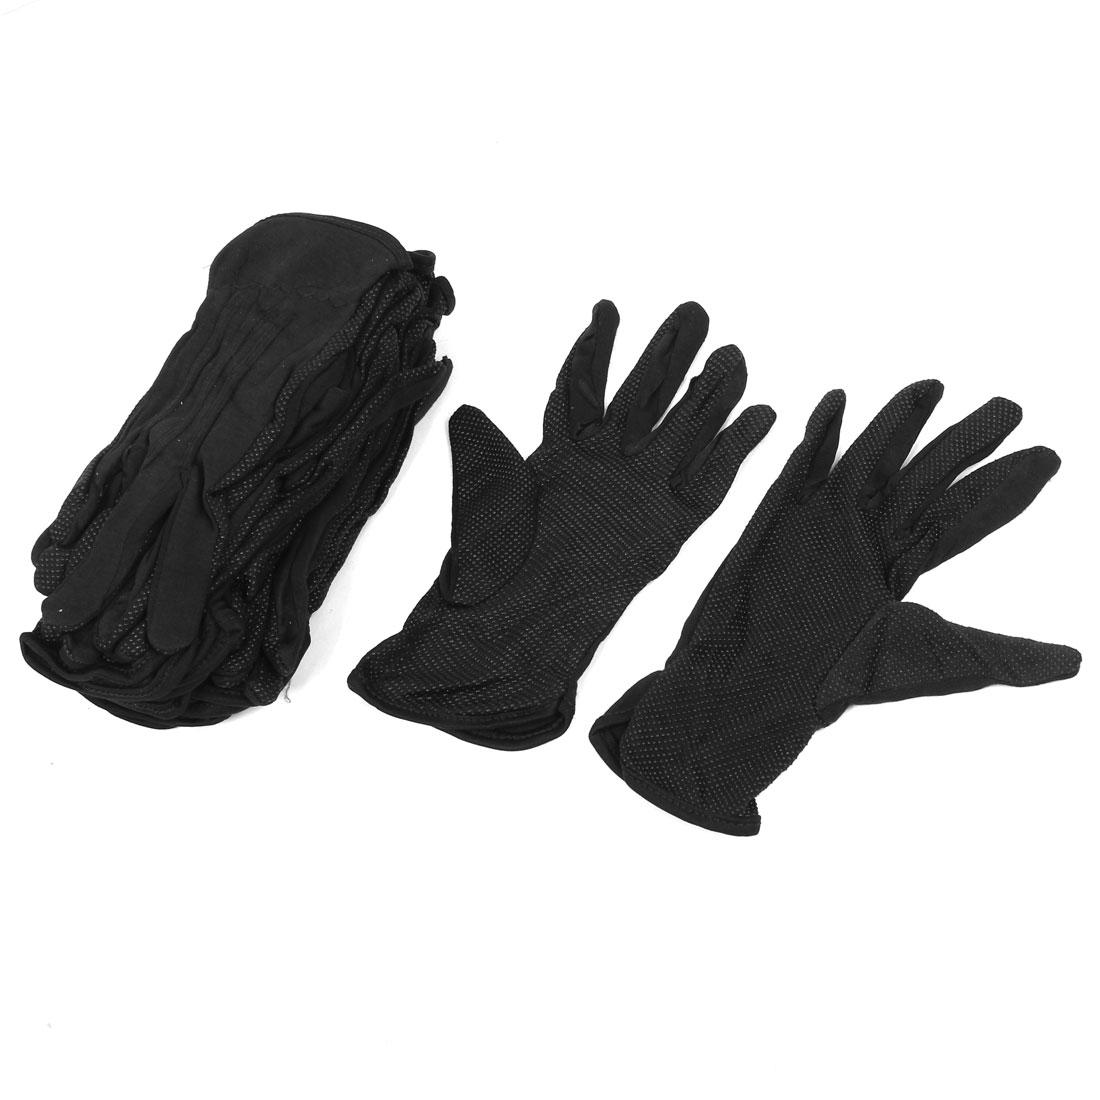 Lady Black Nylon Rubber Full Finger Hand Protect Working Gloves 10 Pair